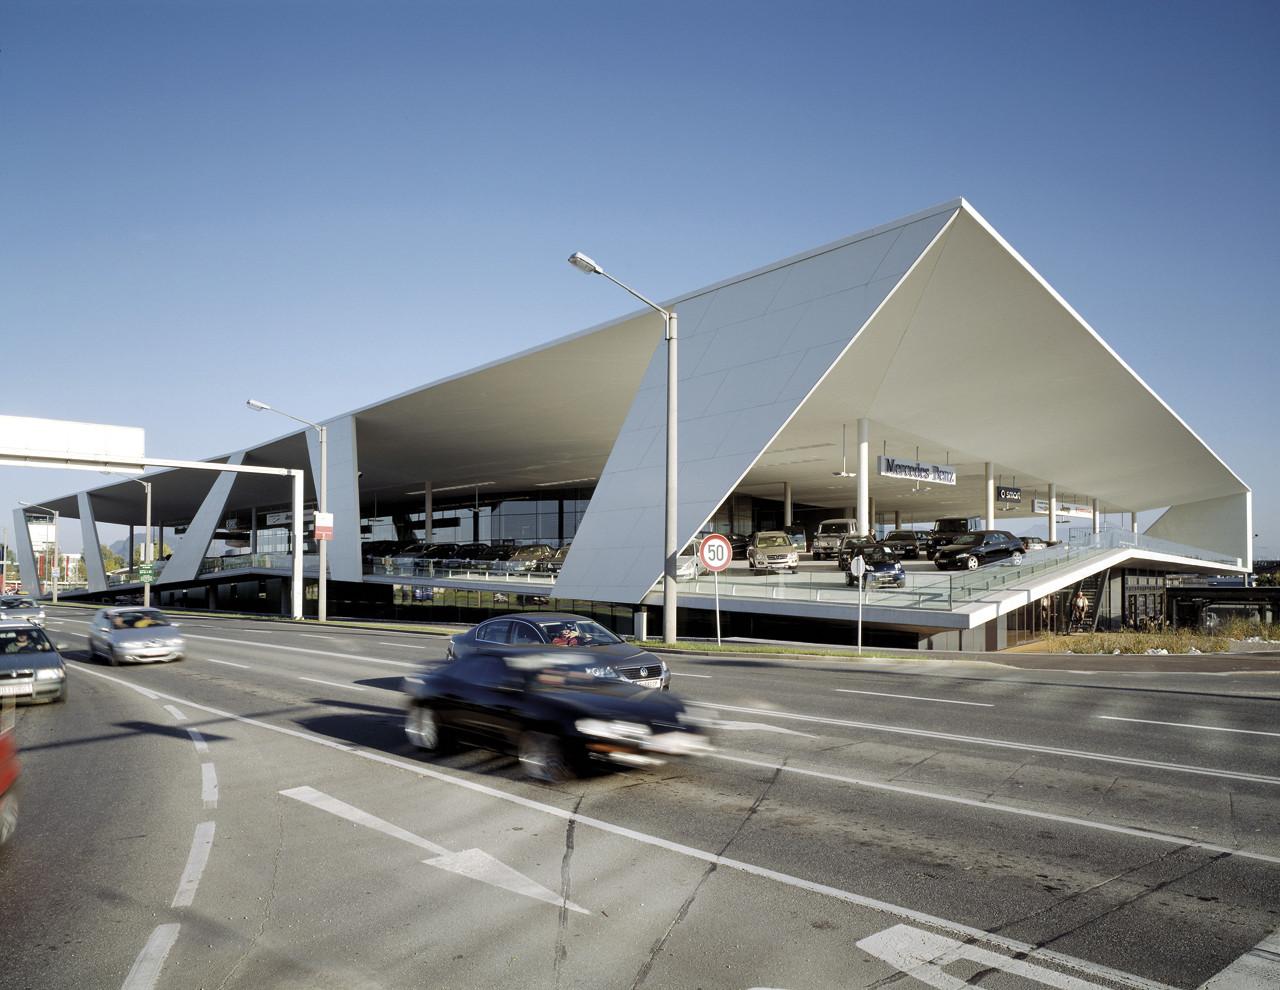 Pappas Headquarters - Mercedes Salzburg / Kadawittfeldarchitektur, © Angelo Kaunat